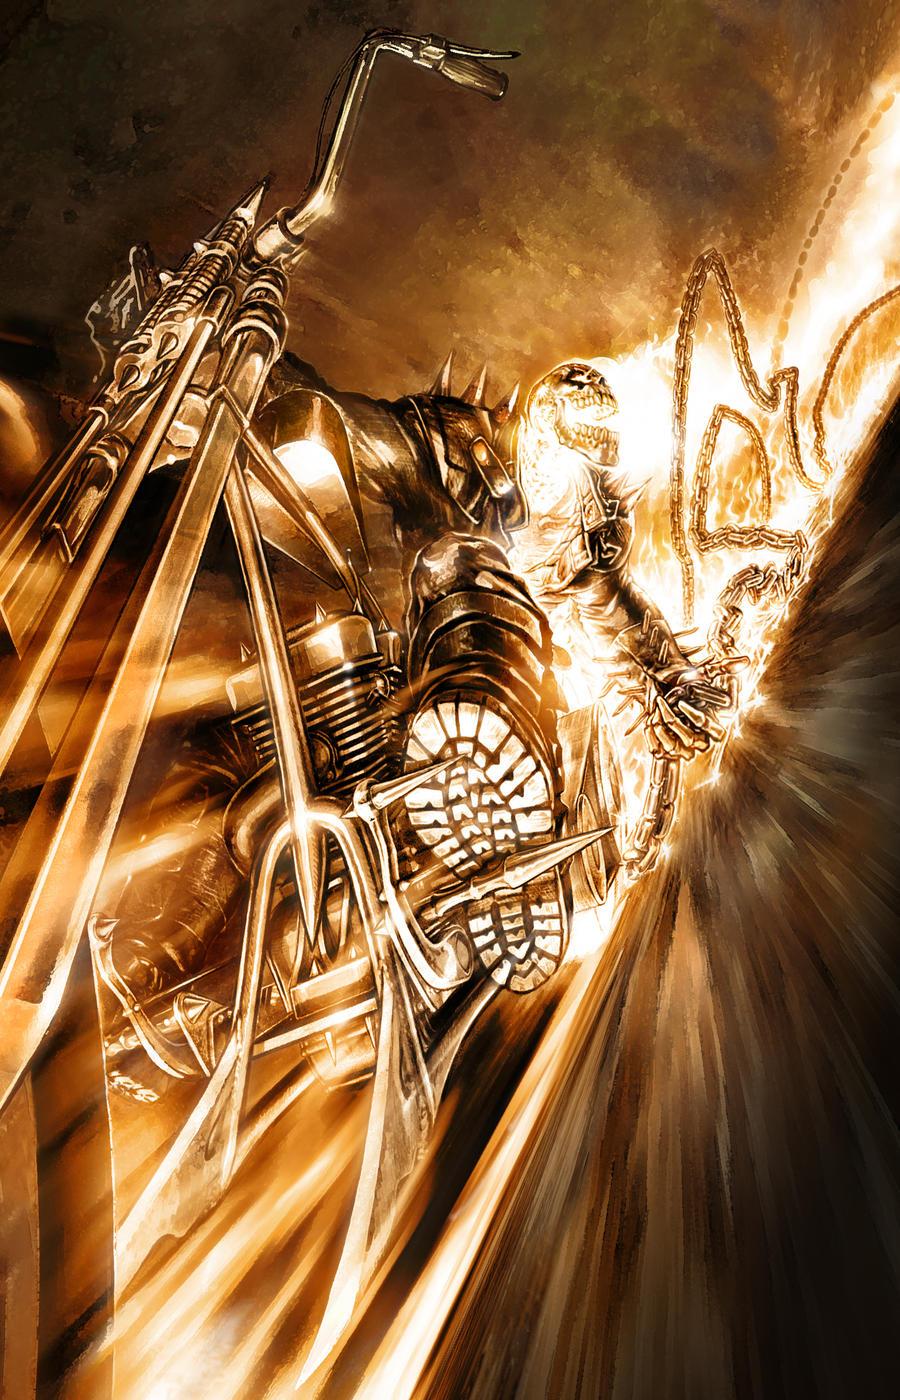 Photoshop Manipulation (Ghost Rider) - Speed Art - YouTube  |Ghost Rider Digital Painting Photoshop